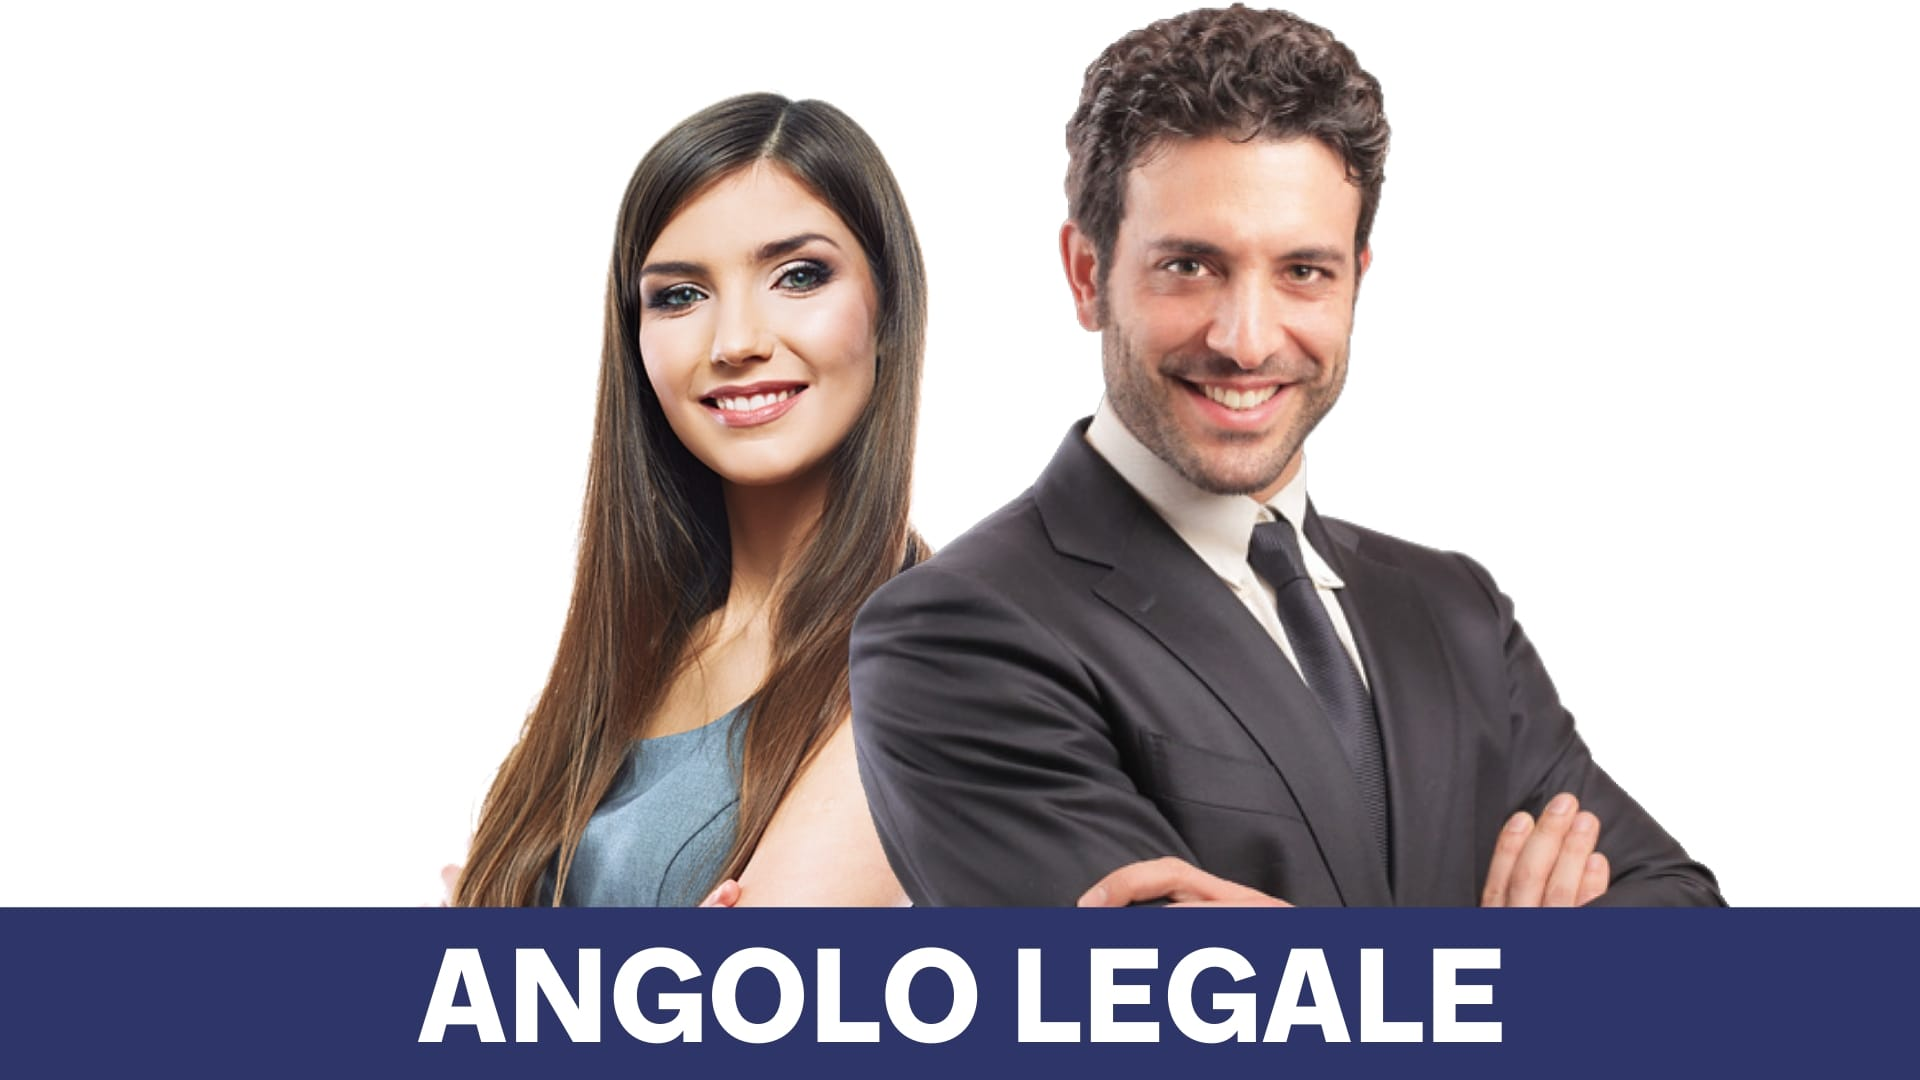 Angolo Legale FIAP v2